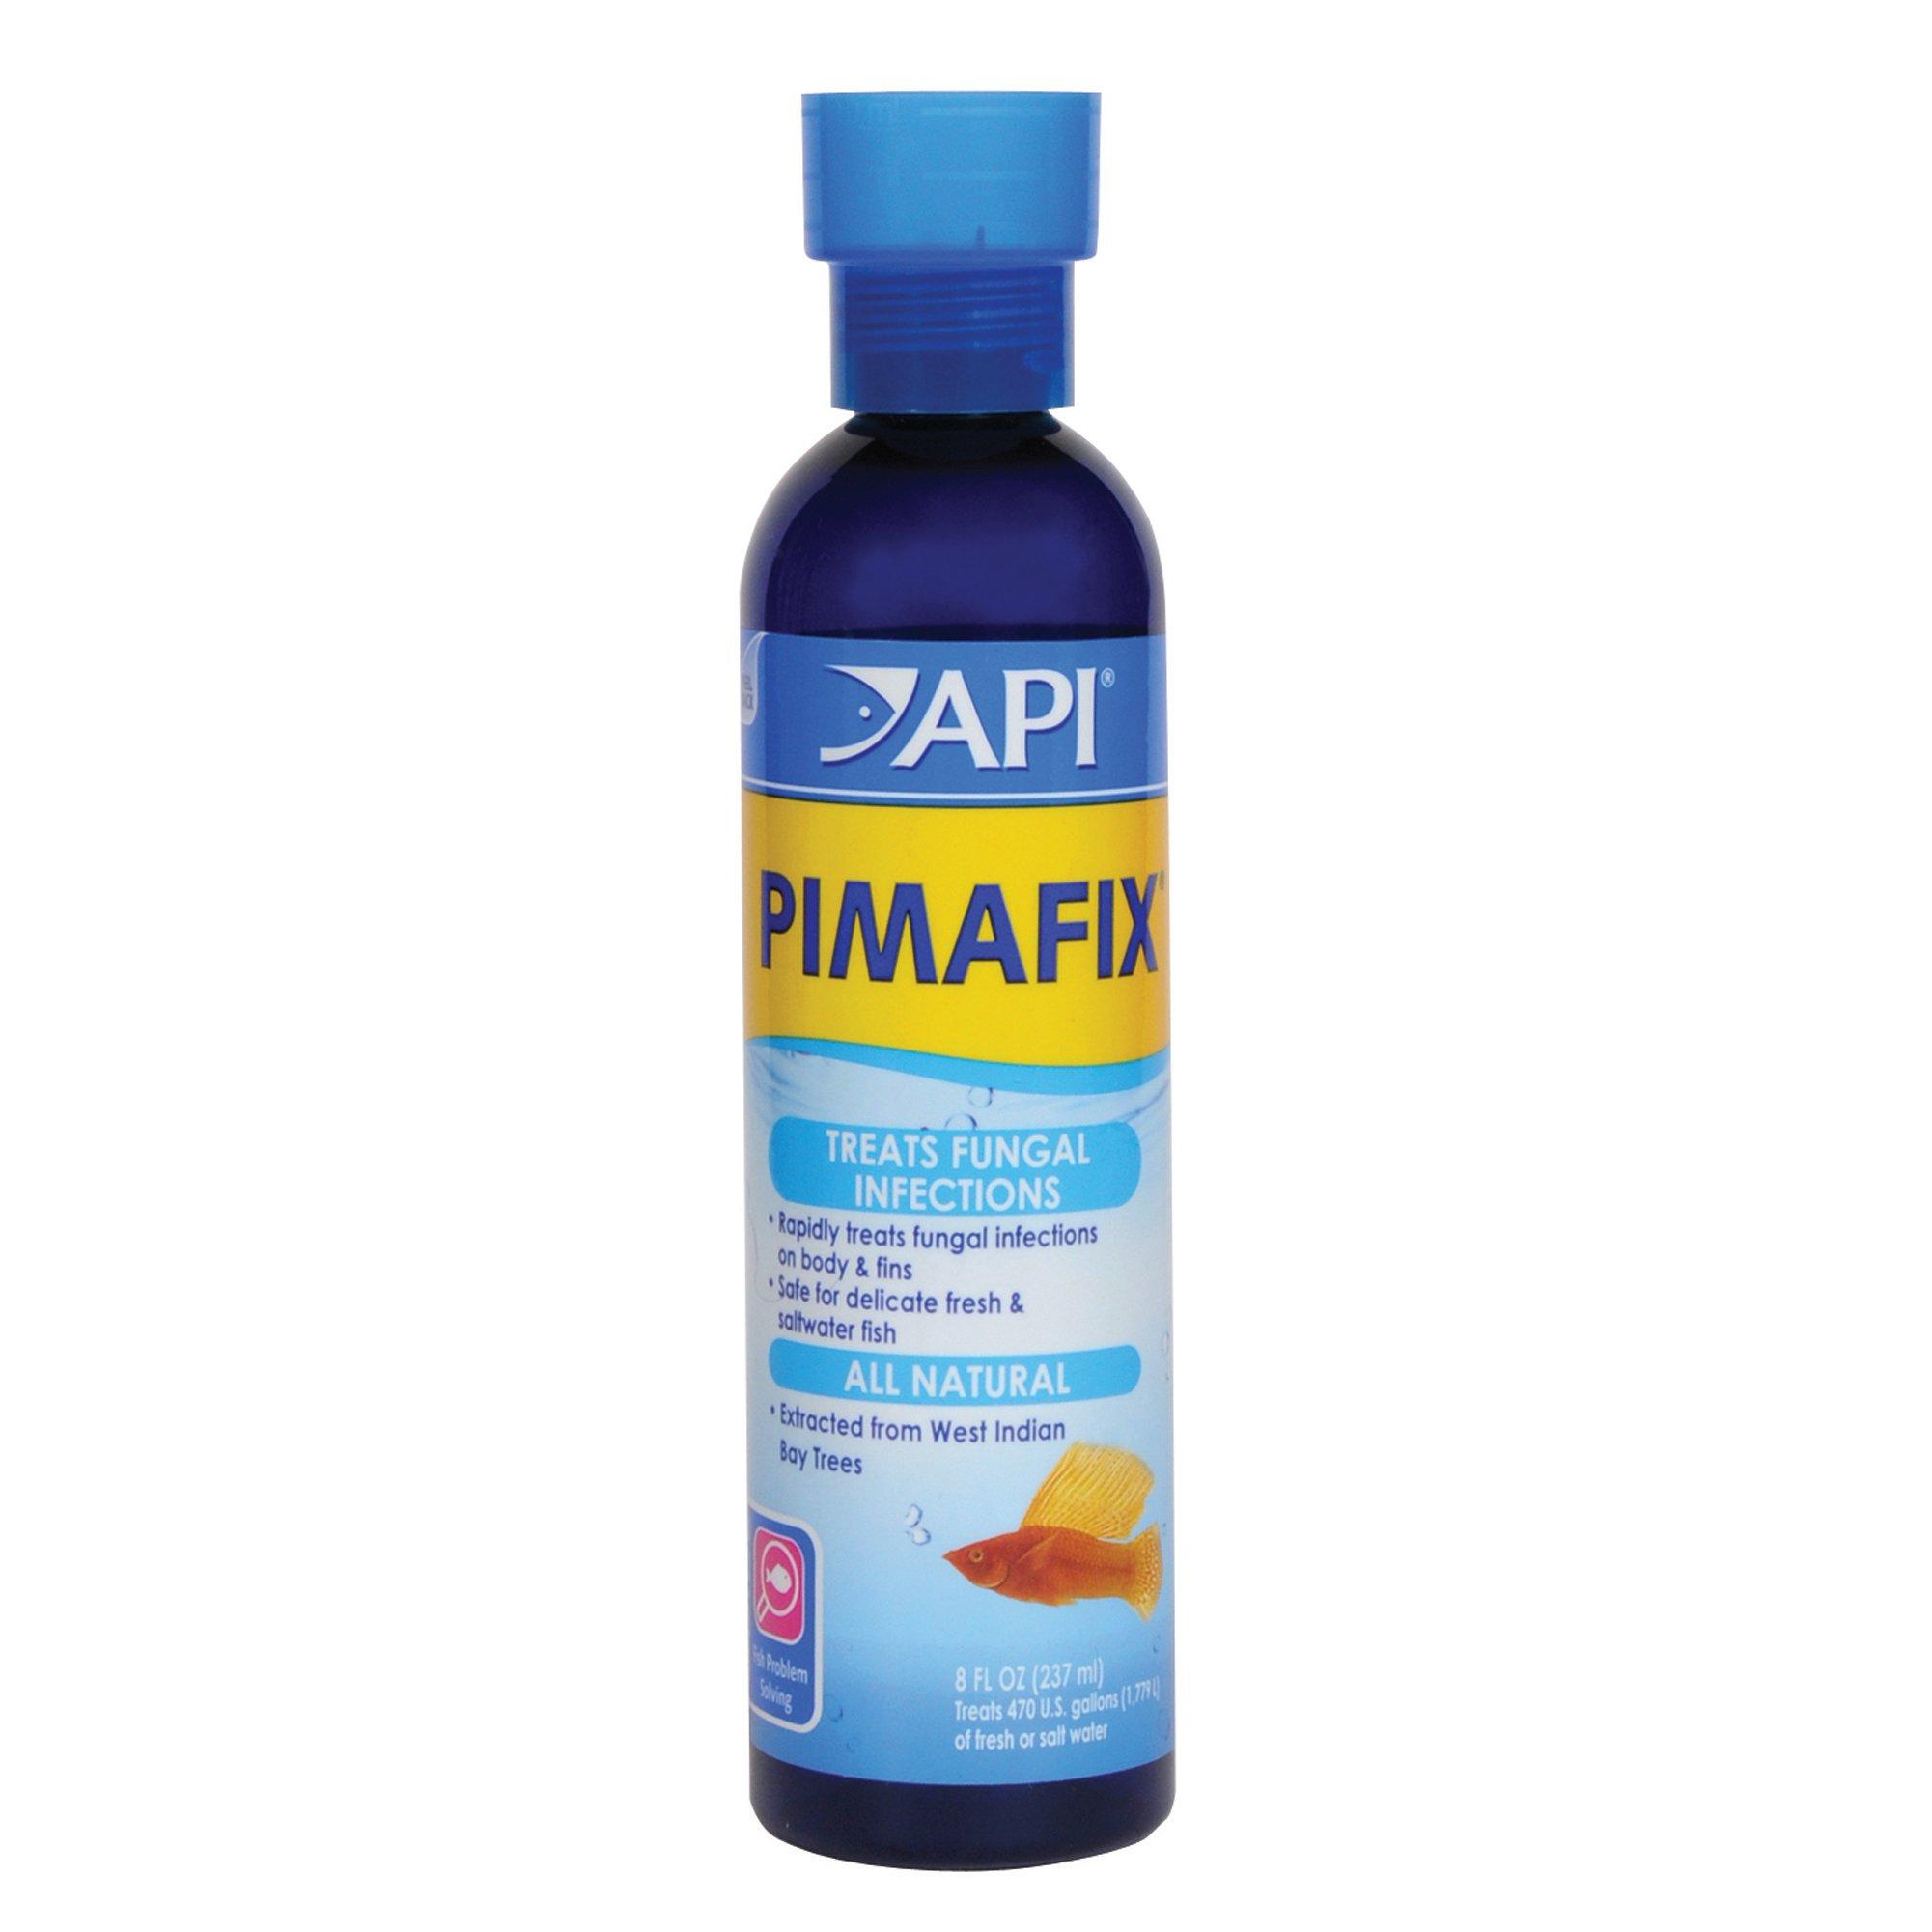 API PIMAFIX Antifungal Freshwater and Saltwater Fish Remedy 8-Ounce Bottle (10H)